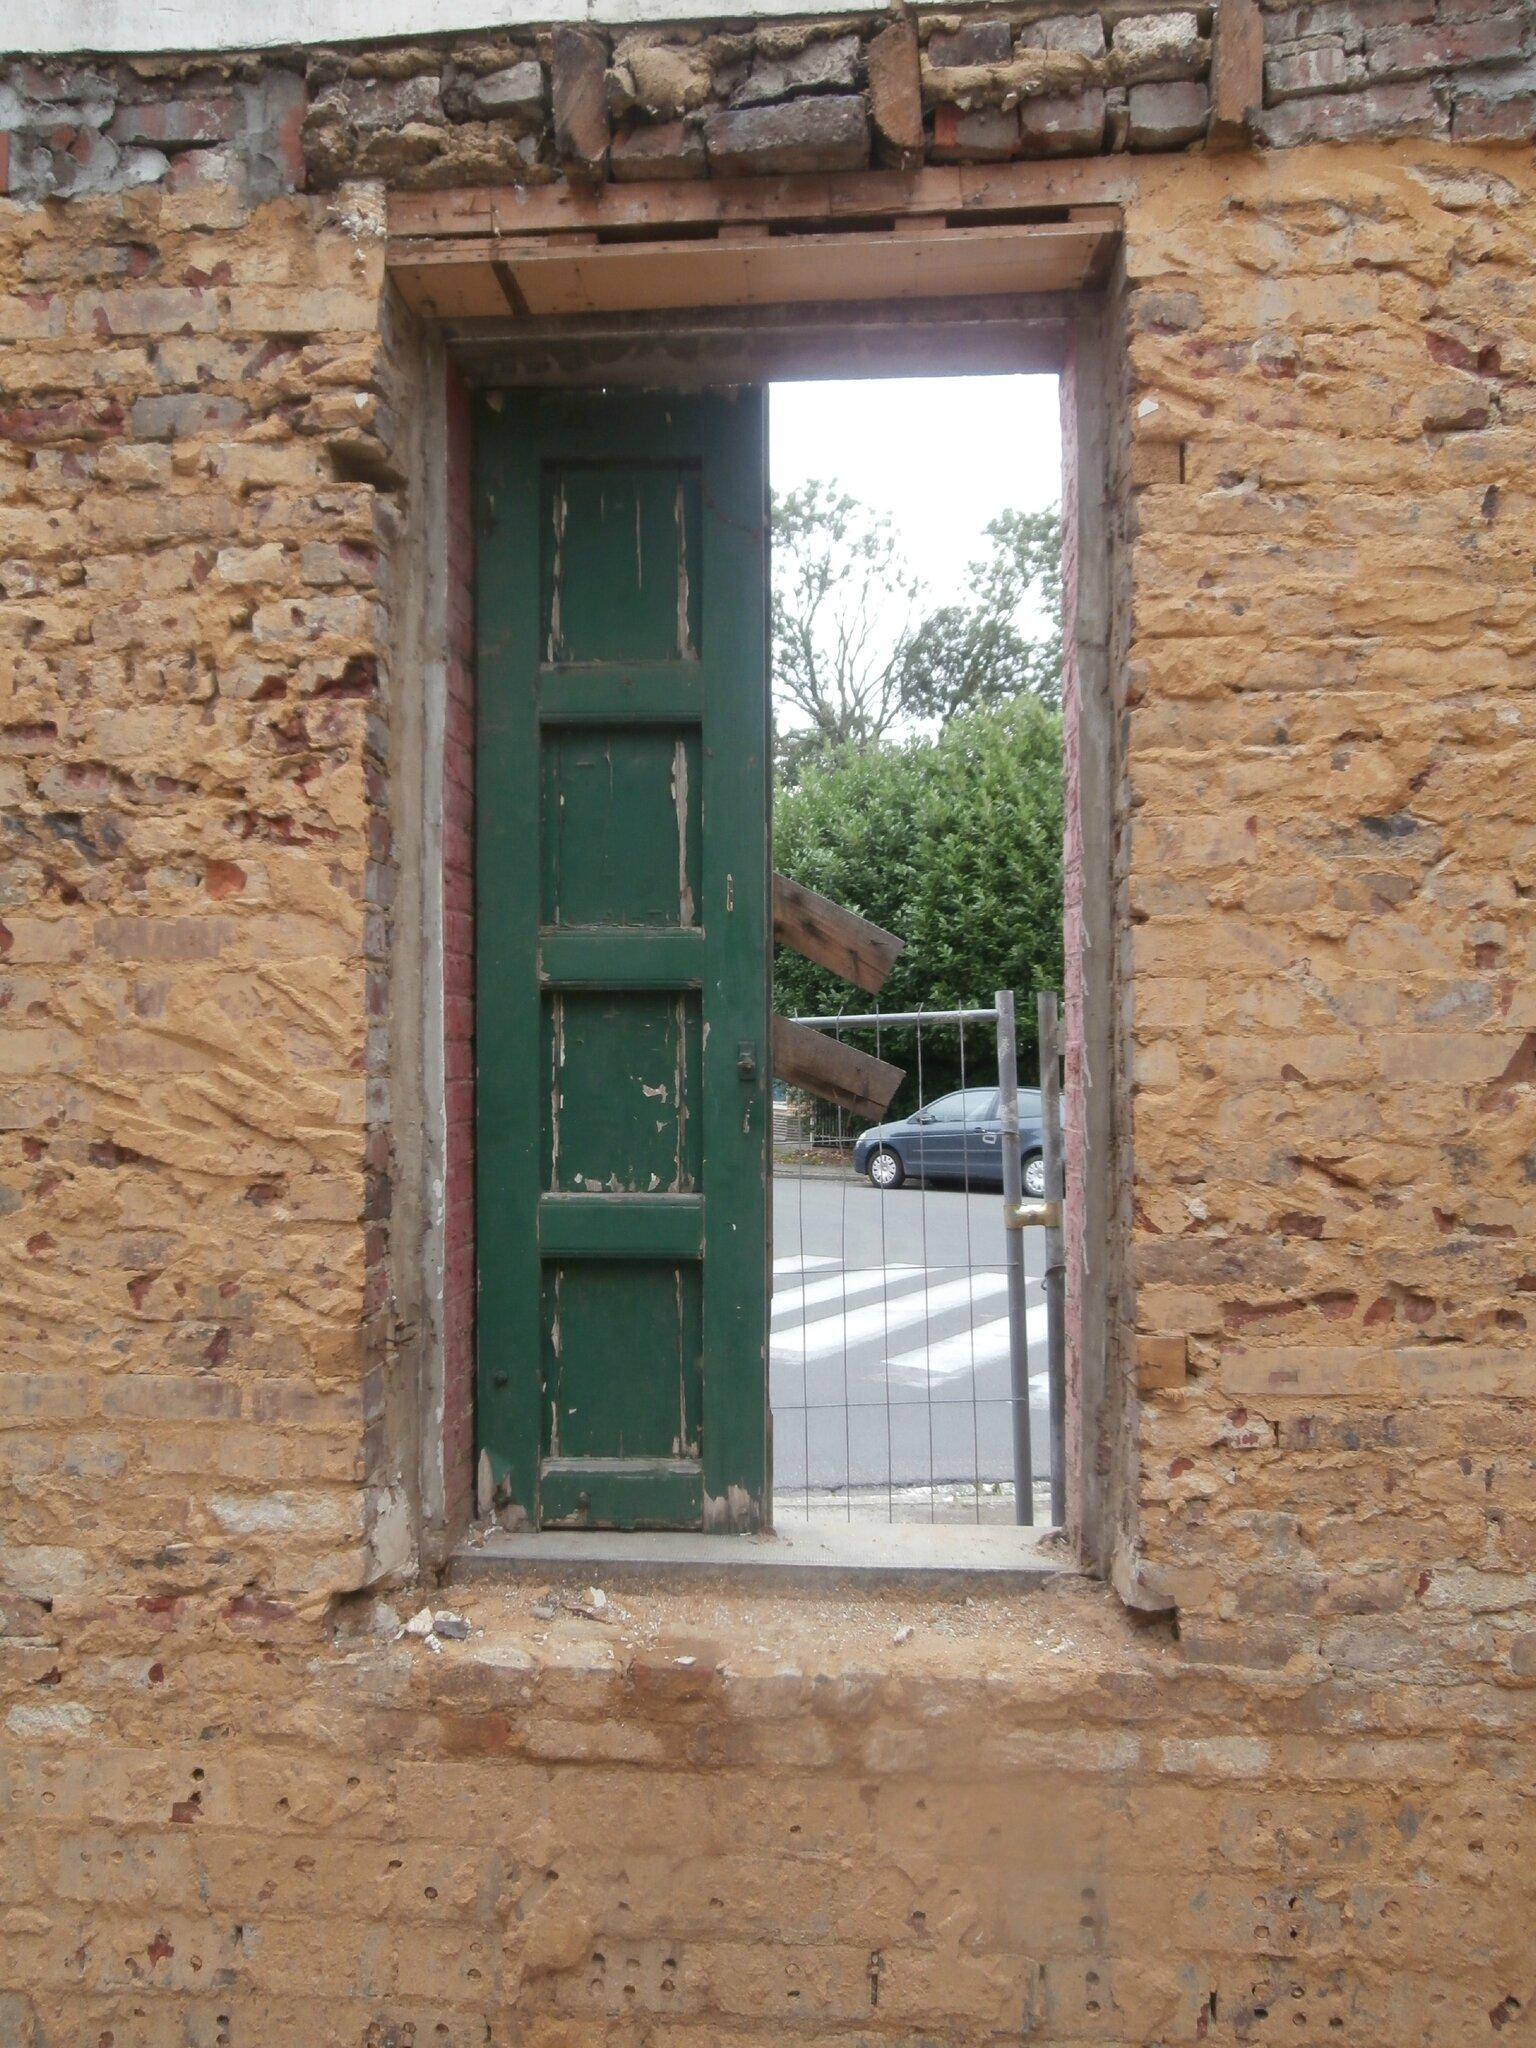 Maison Denis - 2014-07-21 - P7216361